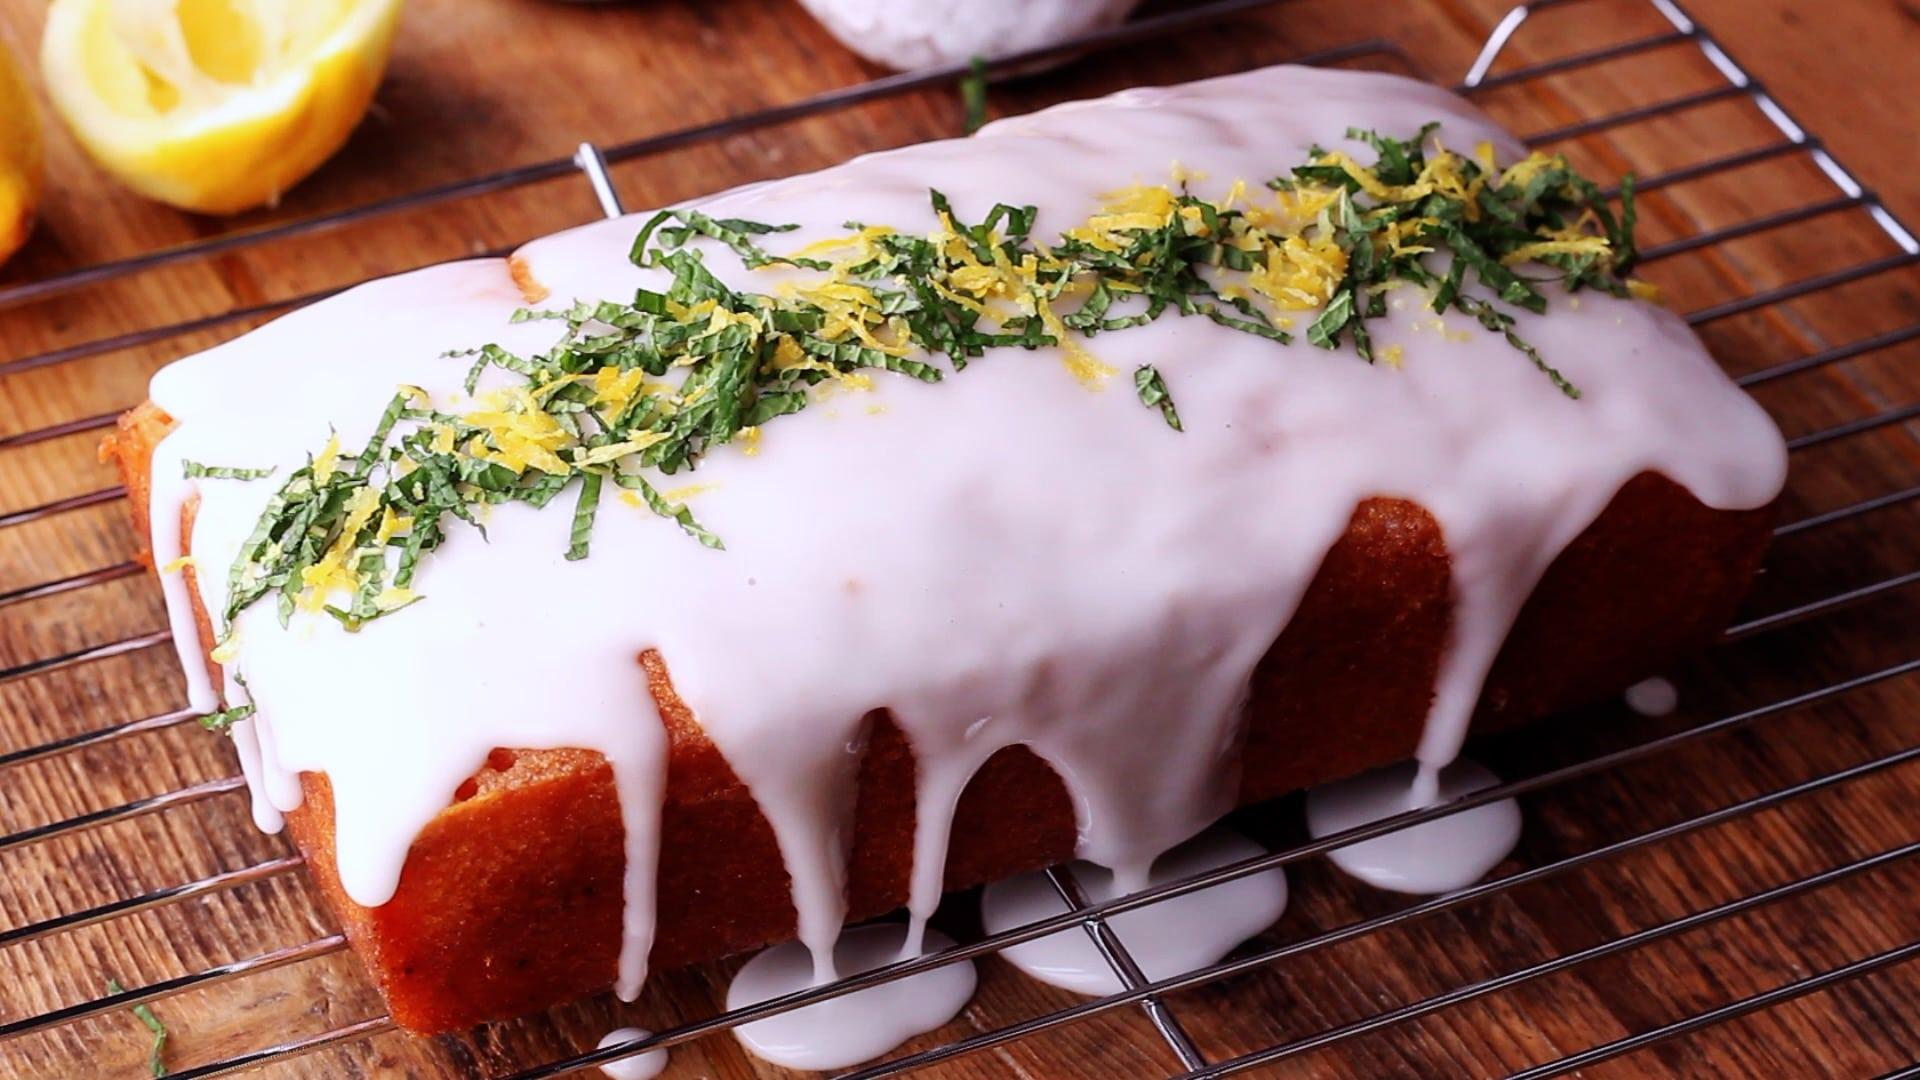 Decorate with lemon icing, fresh mint and lemon zest